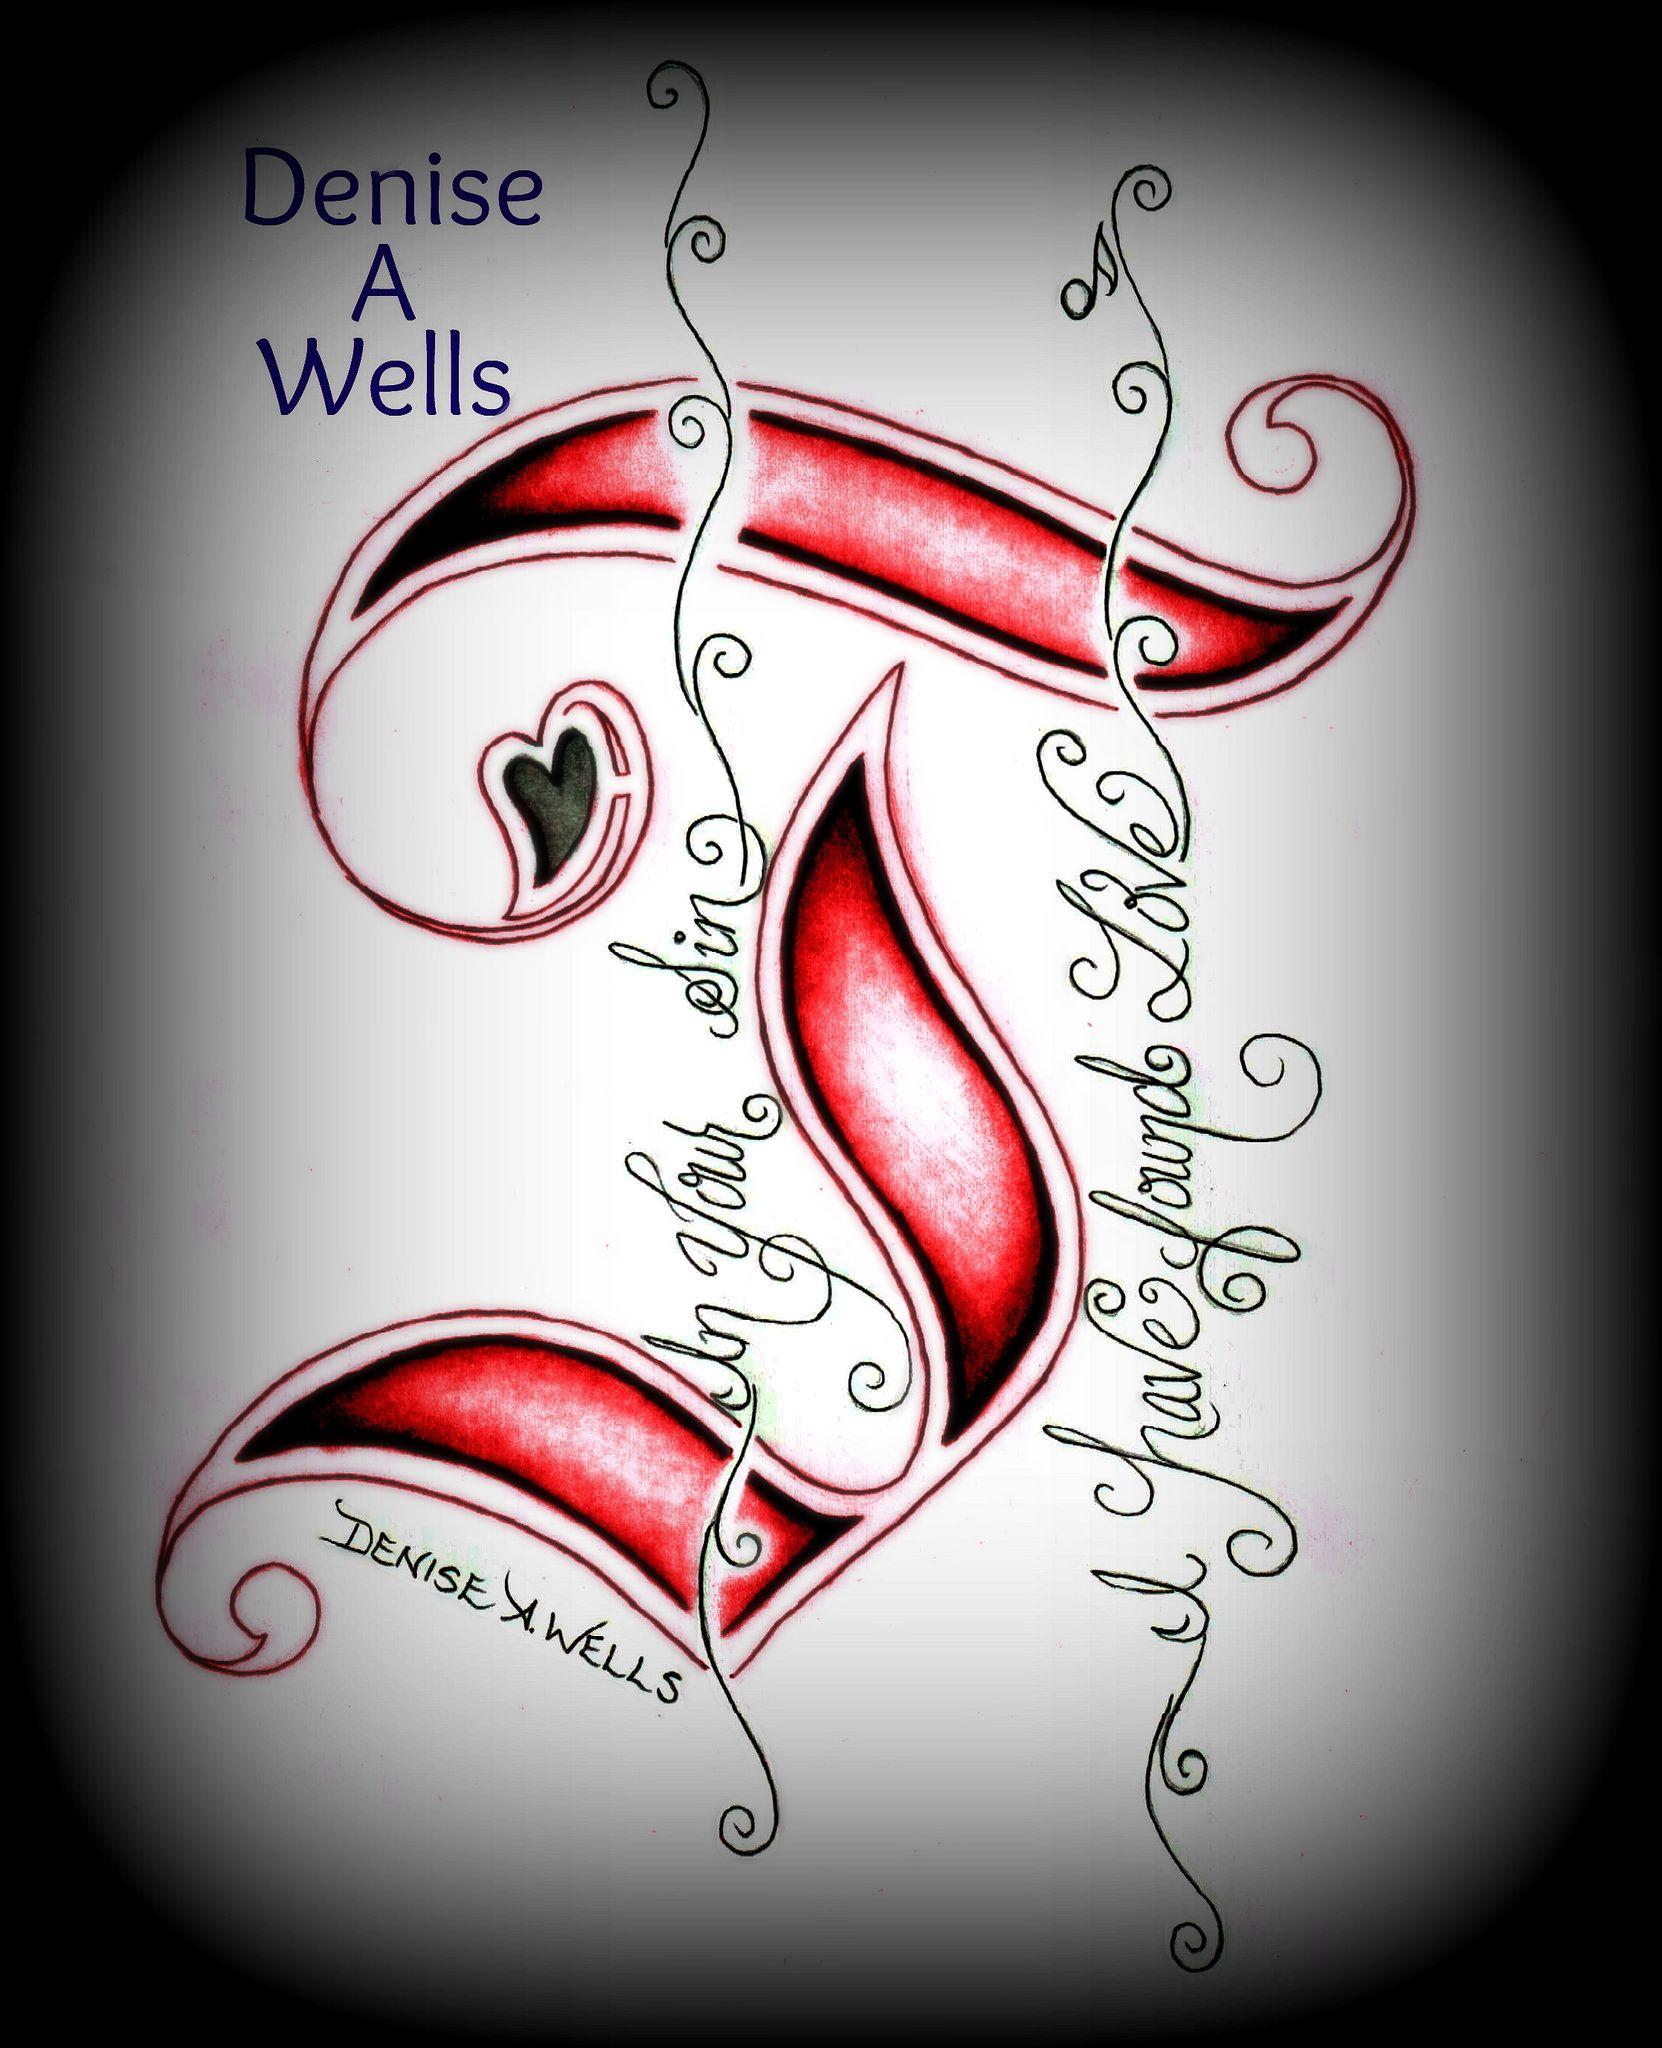 J - Love Tattoo Design By Denise A. Wells